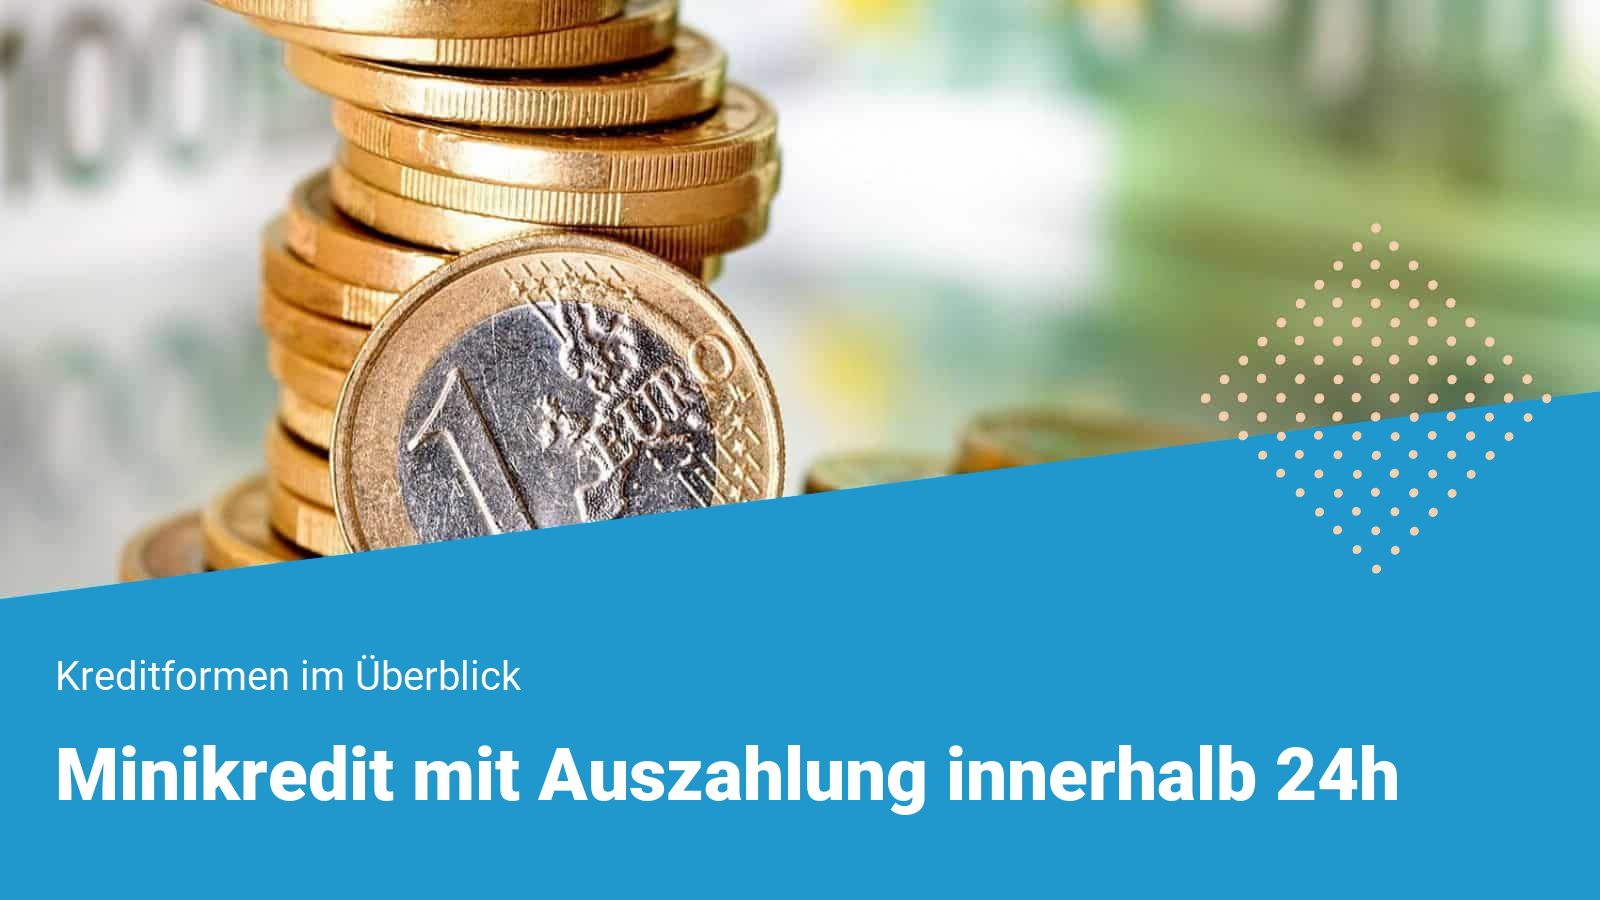 money-kurzzeitkredit-min